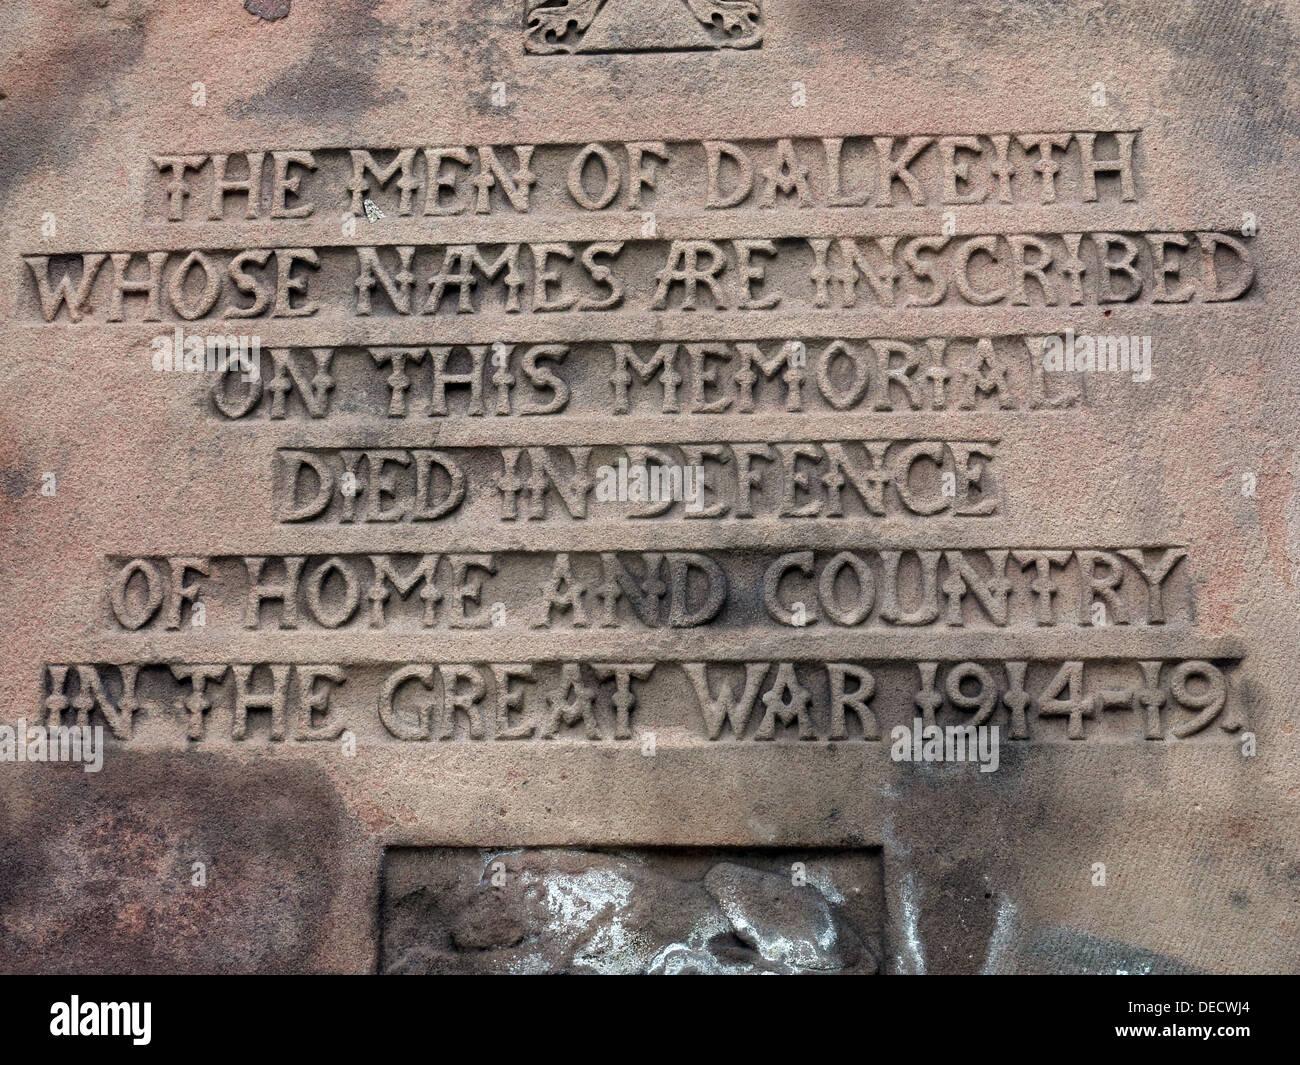 Laden Sie dieses Alamy Stockfoto Inschriften auf Dalkeith Krieg Denkmal 1914-19, Midlothian, Scotland, UK - DECWJ4